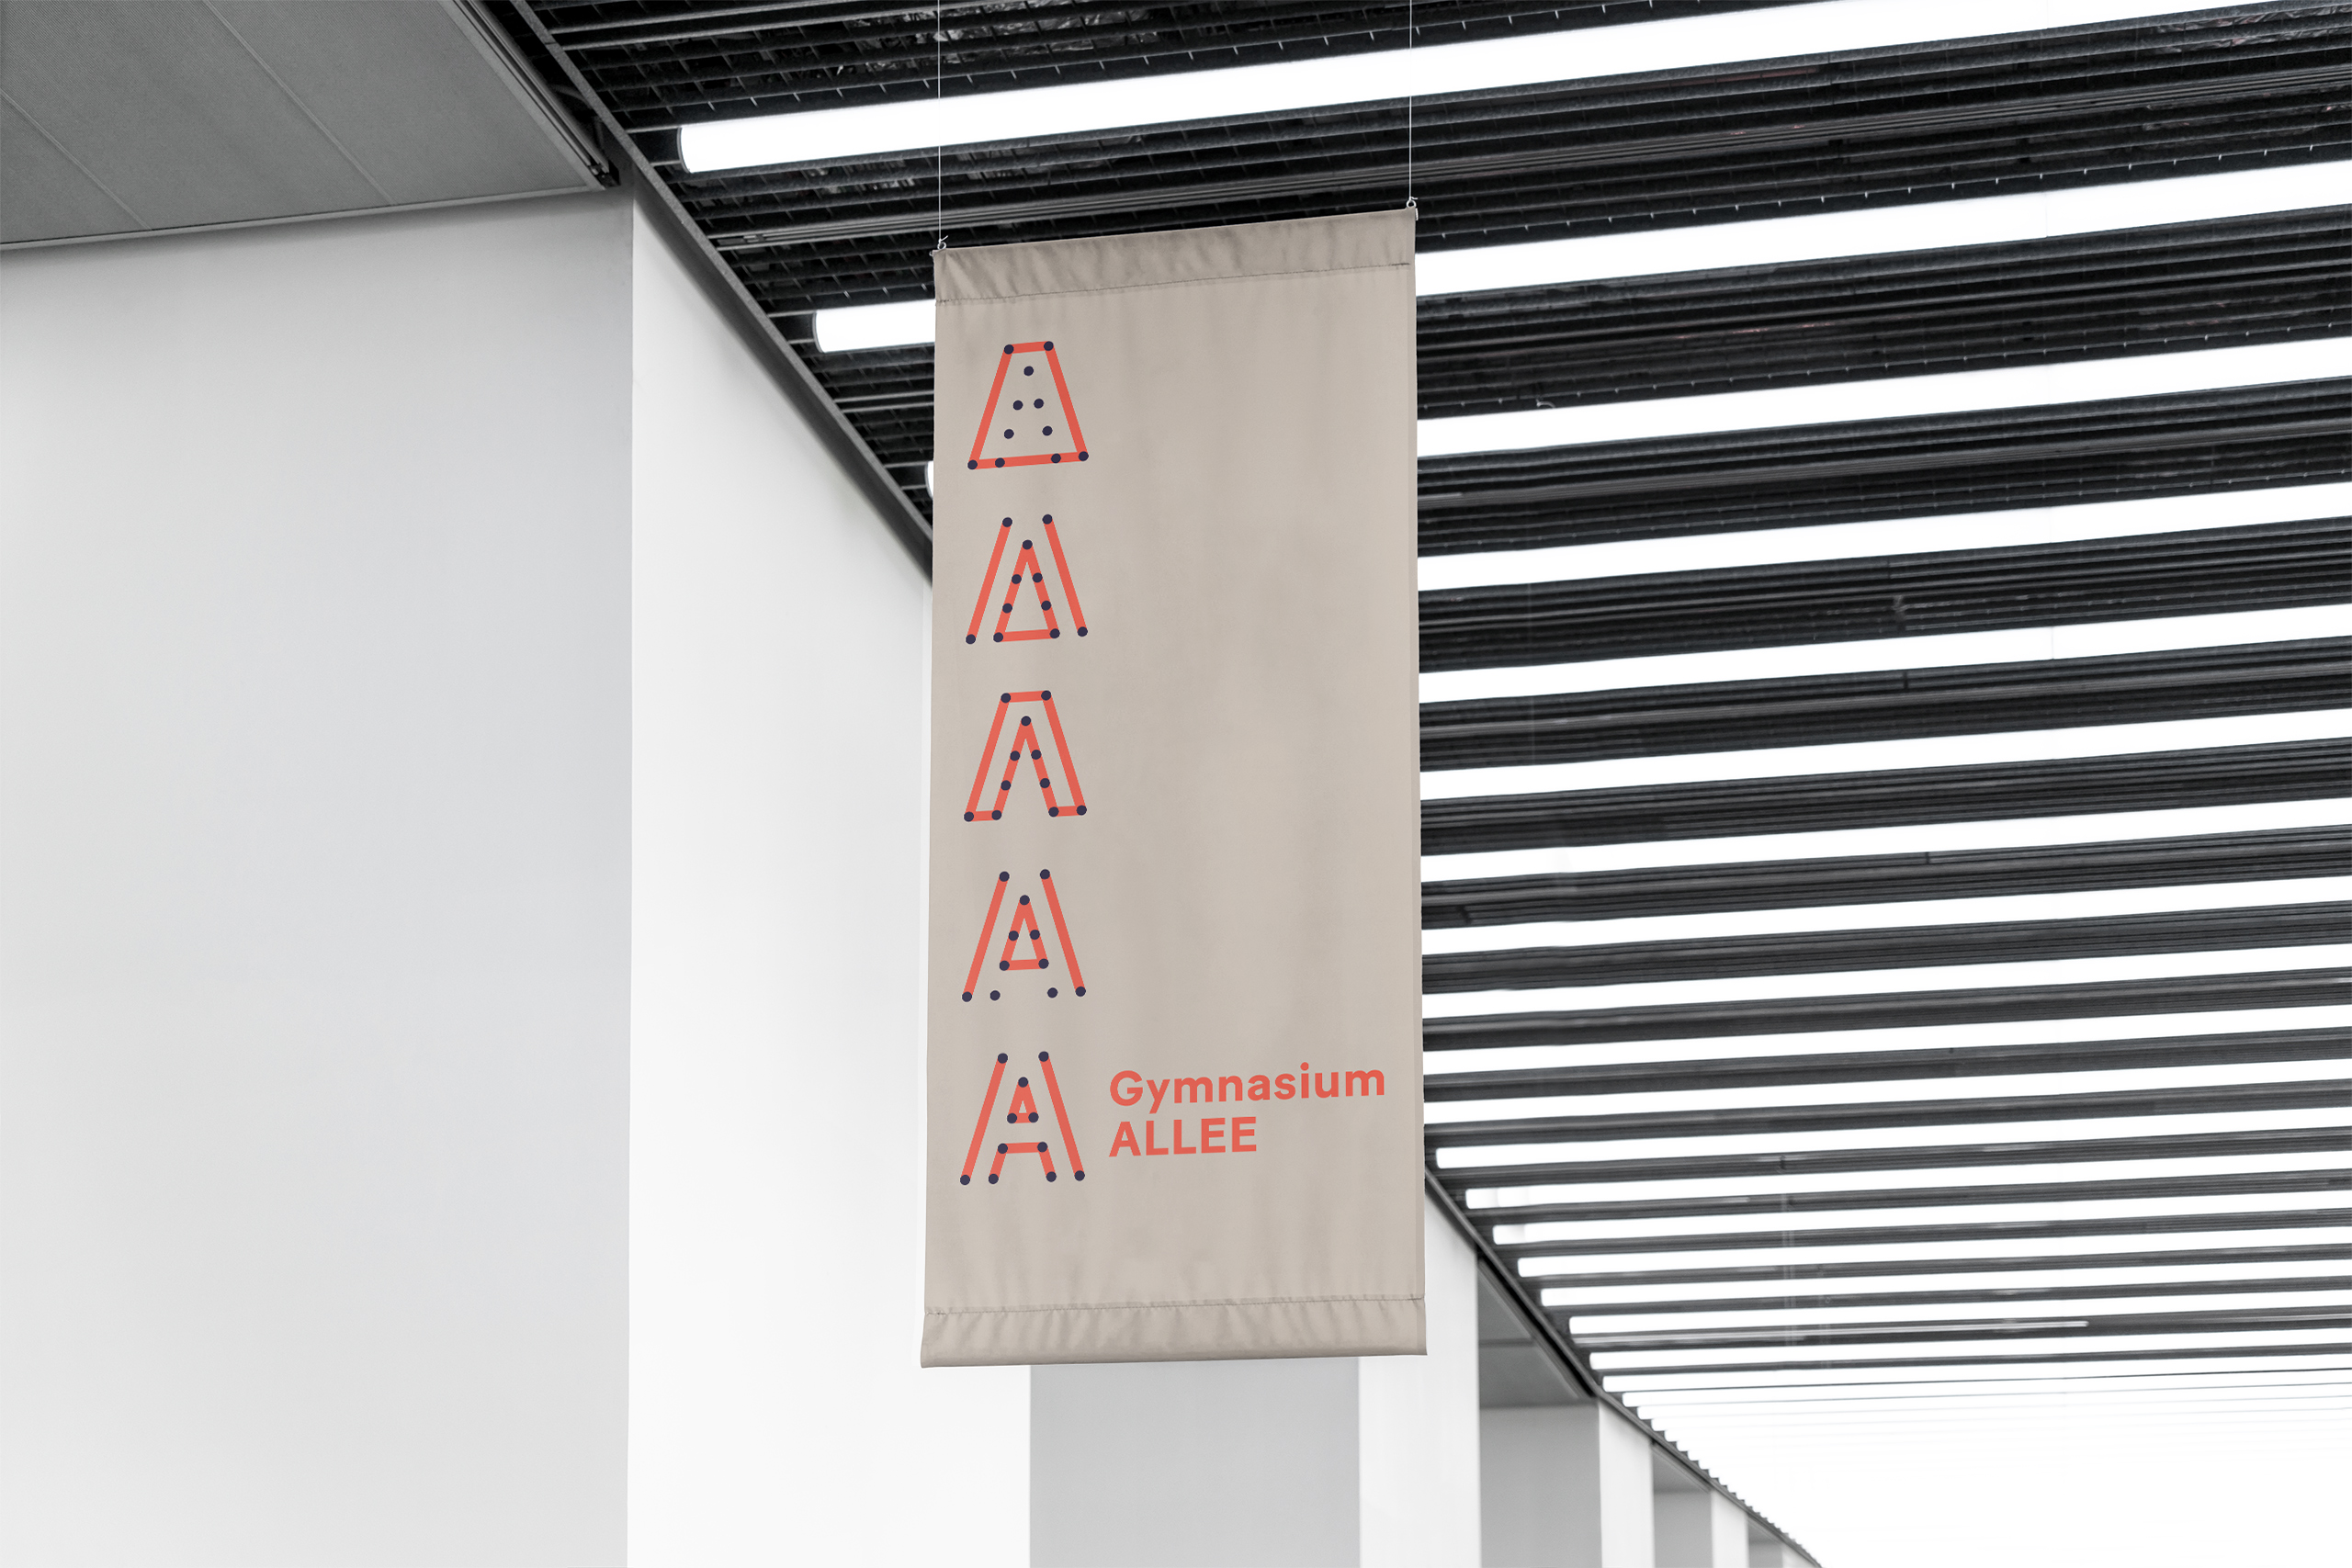 Gymnasium-ALLEE-Corporate-design-Flag2